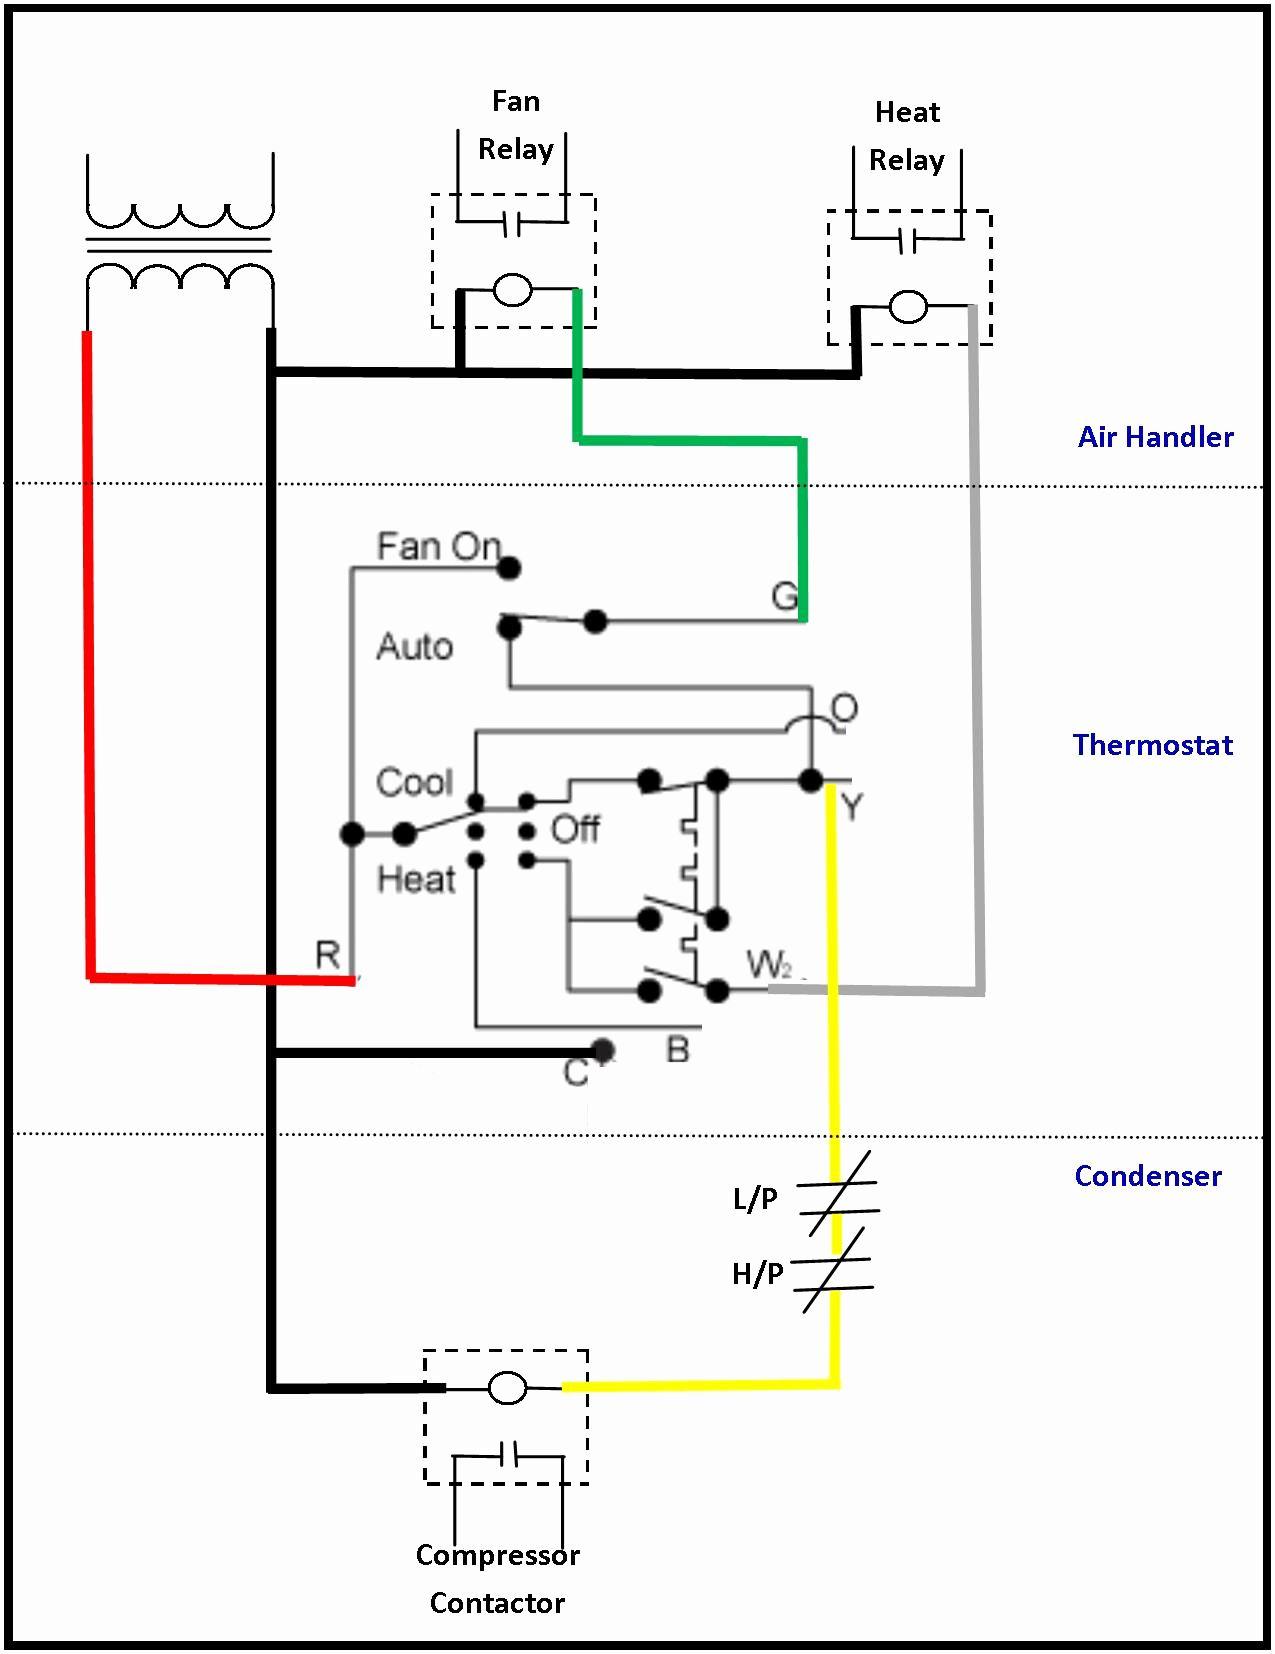 Buck Boost Transformer Wiring Diagram - Trusted Wiring Diagram - Buck Boost Transformer Wiring Diagram